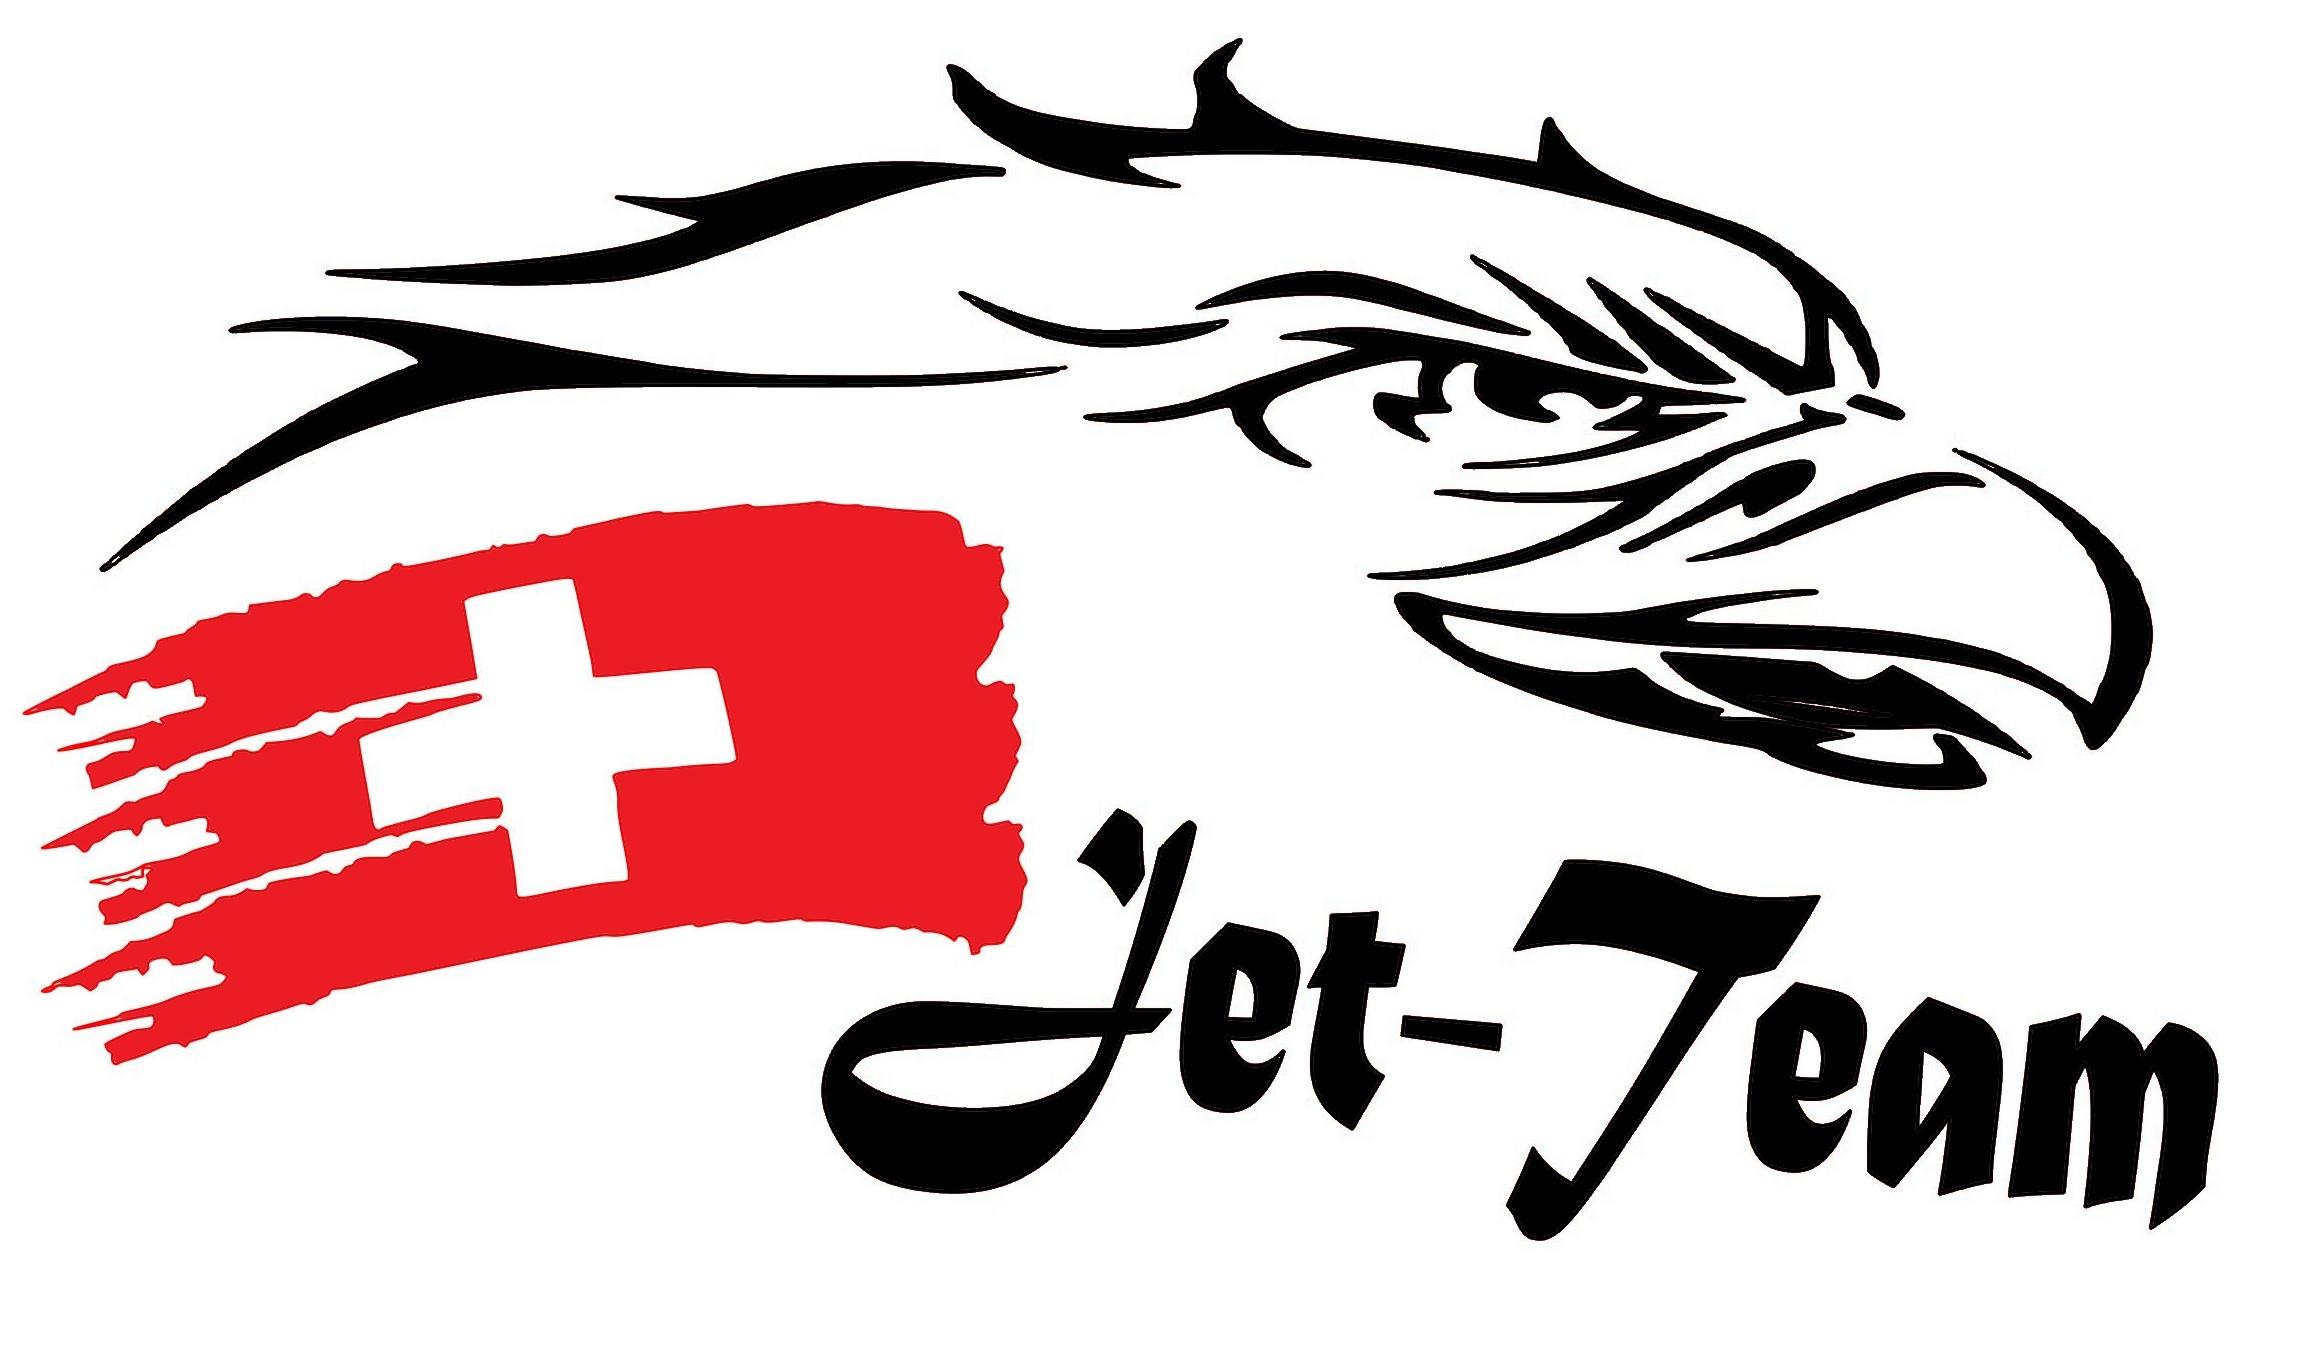 Swiss Jet Team